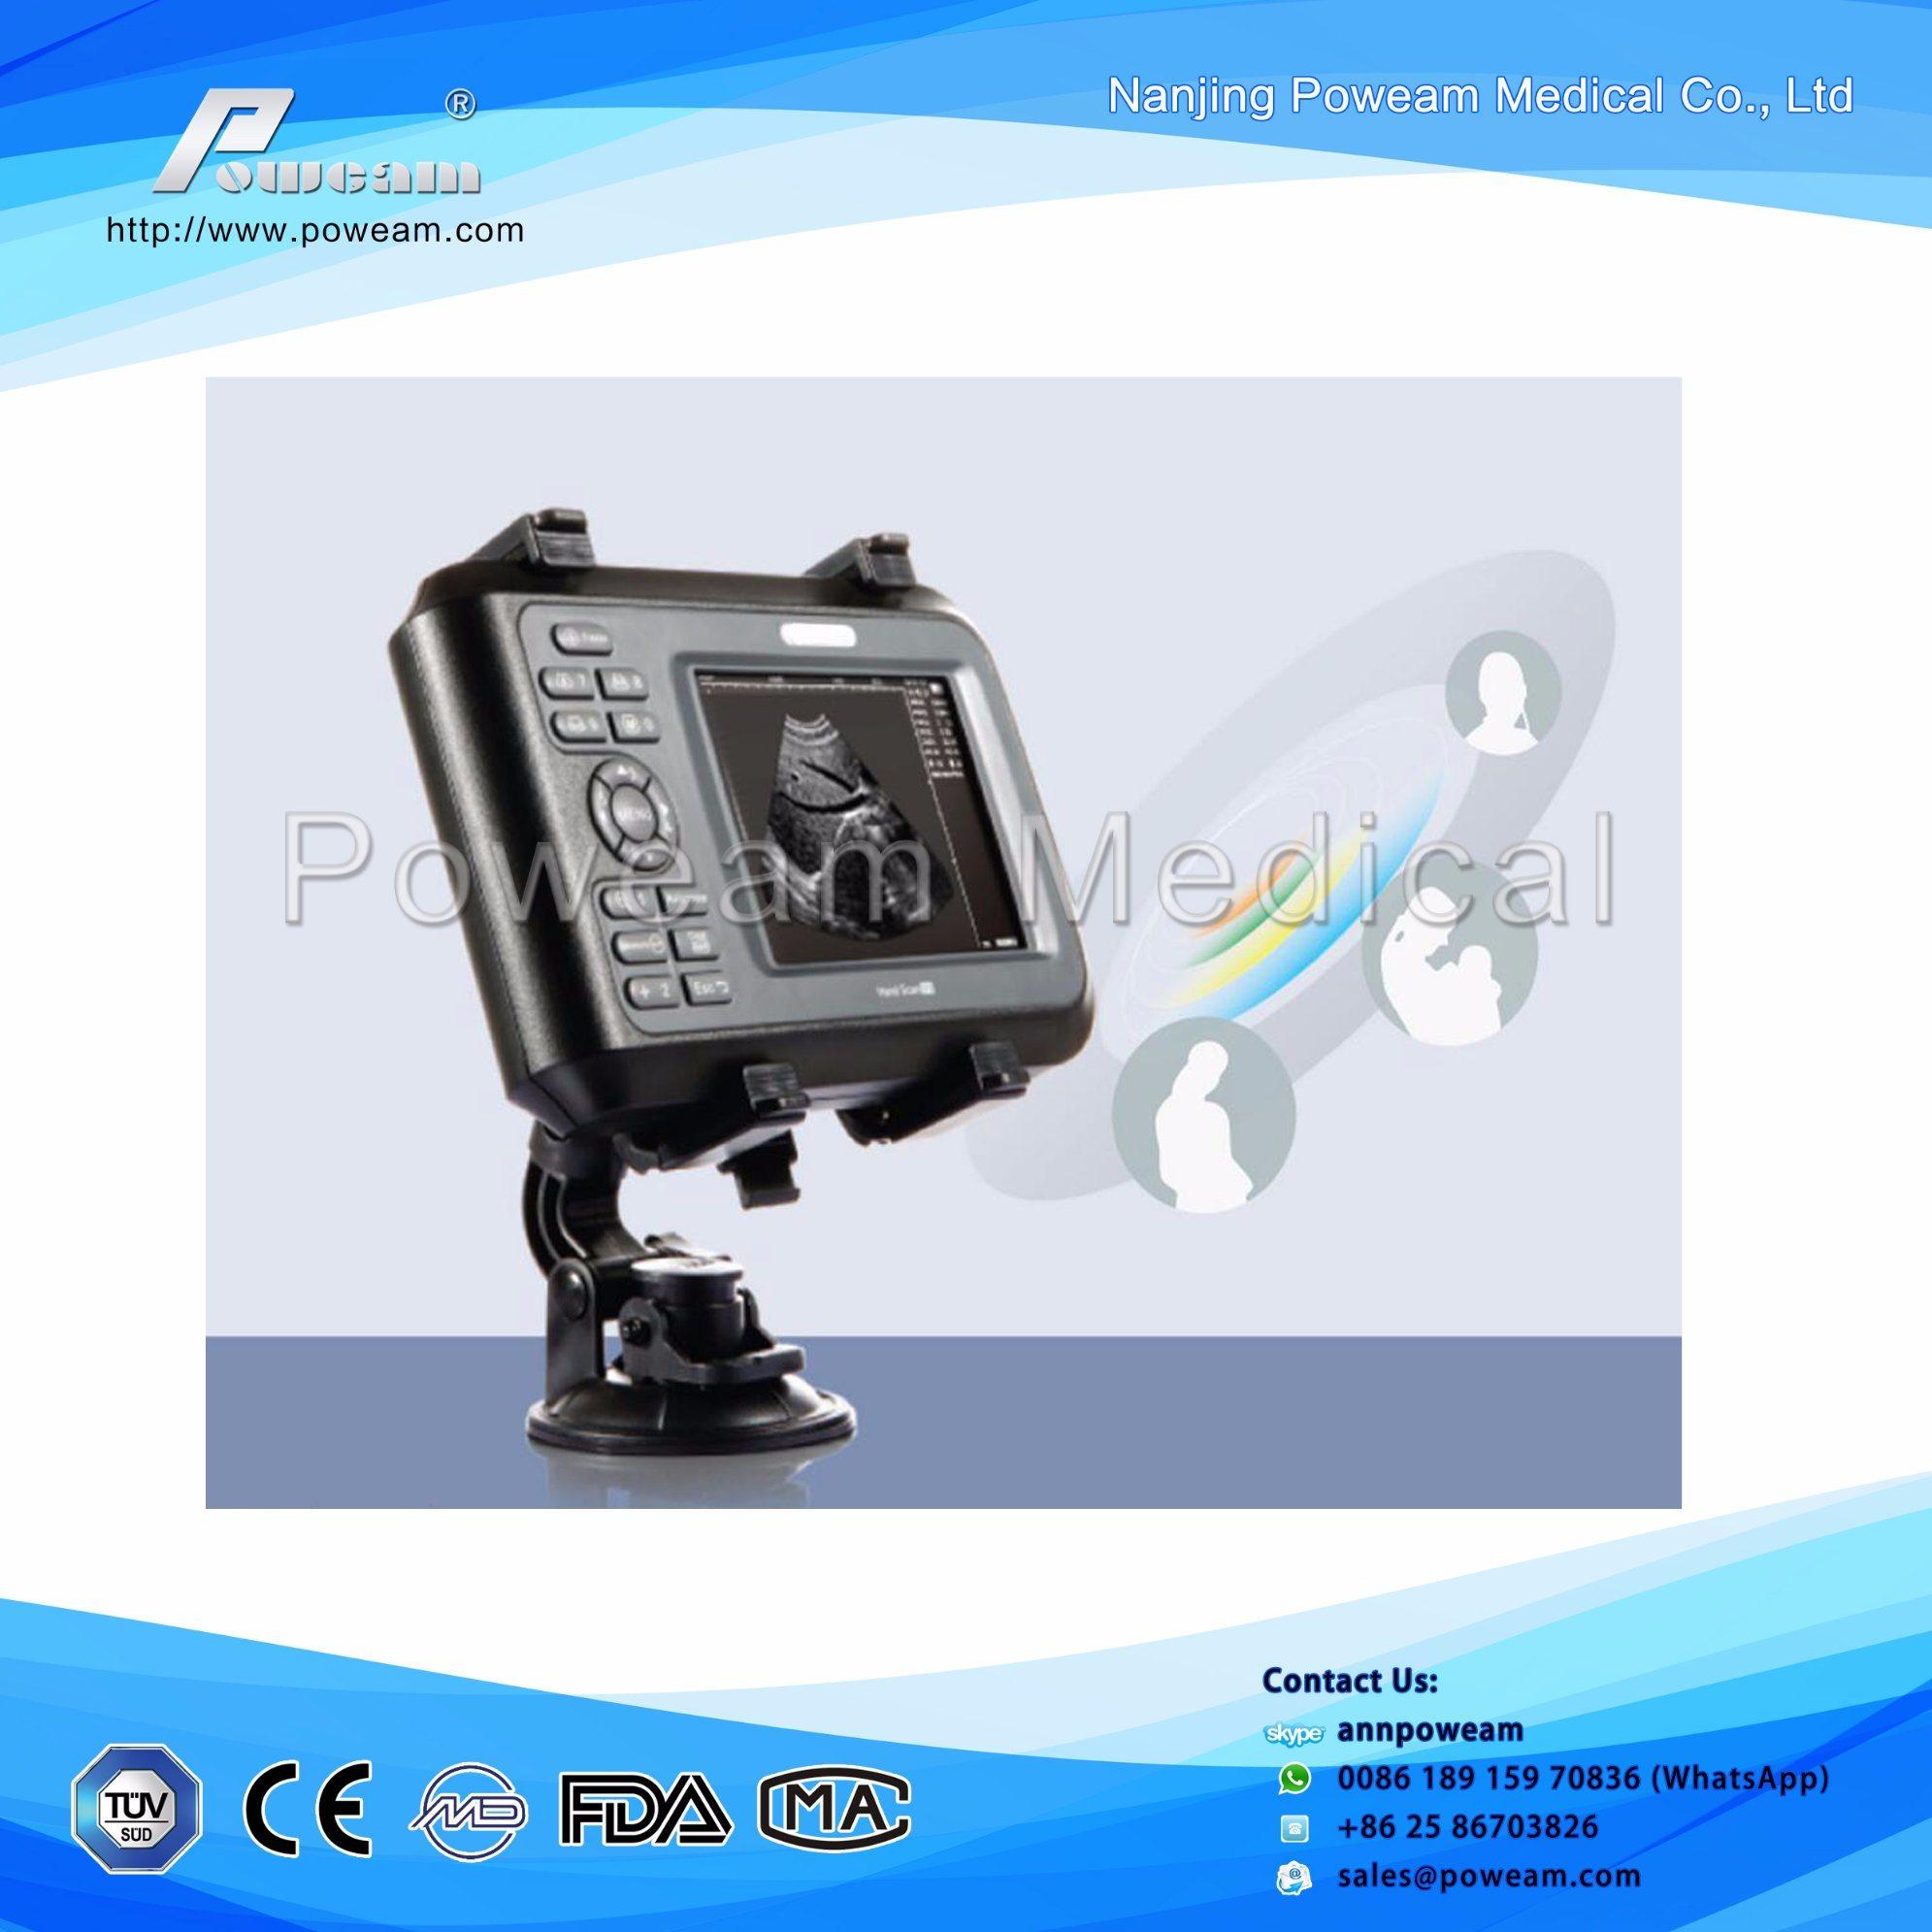 Daftar Harga Printer Usg Termurah 2018 Fujixerox Dpm225dw China Portable Usb For Laptop Palm Ultrasound Probe Scanner Handheld